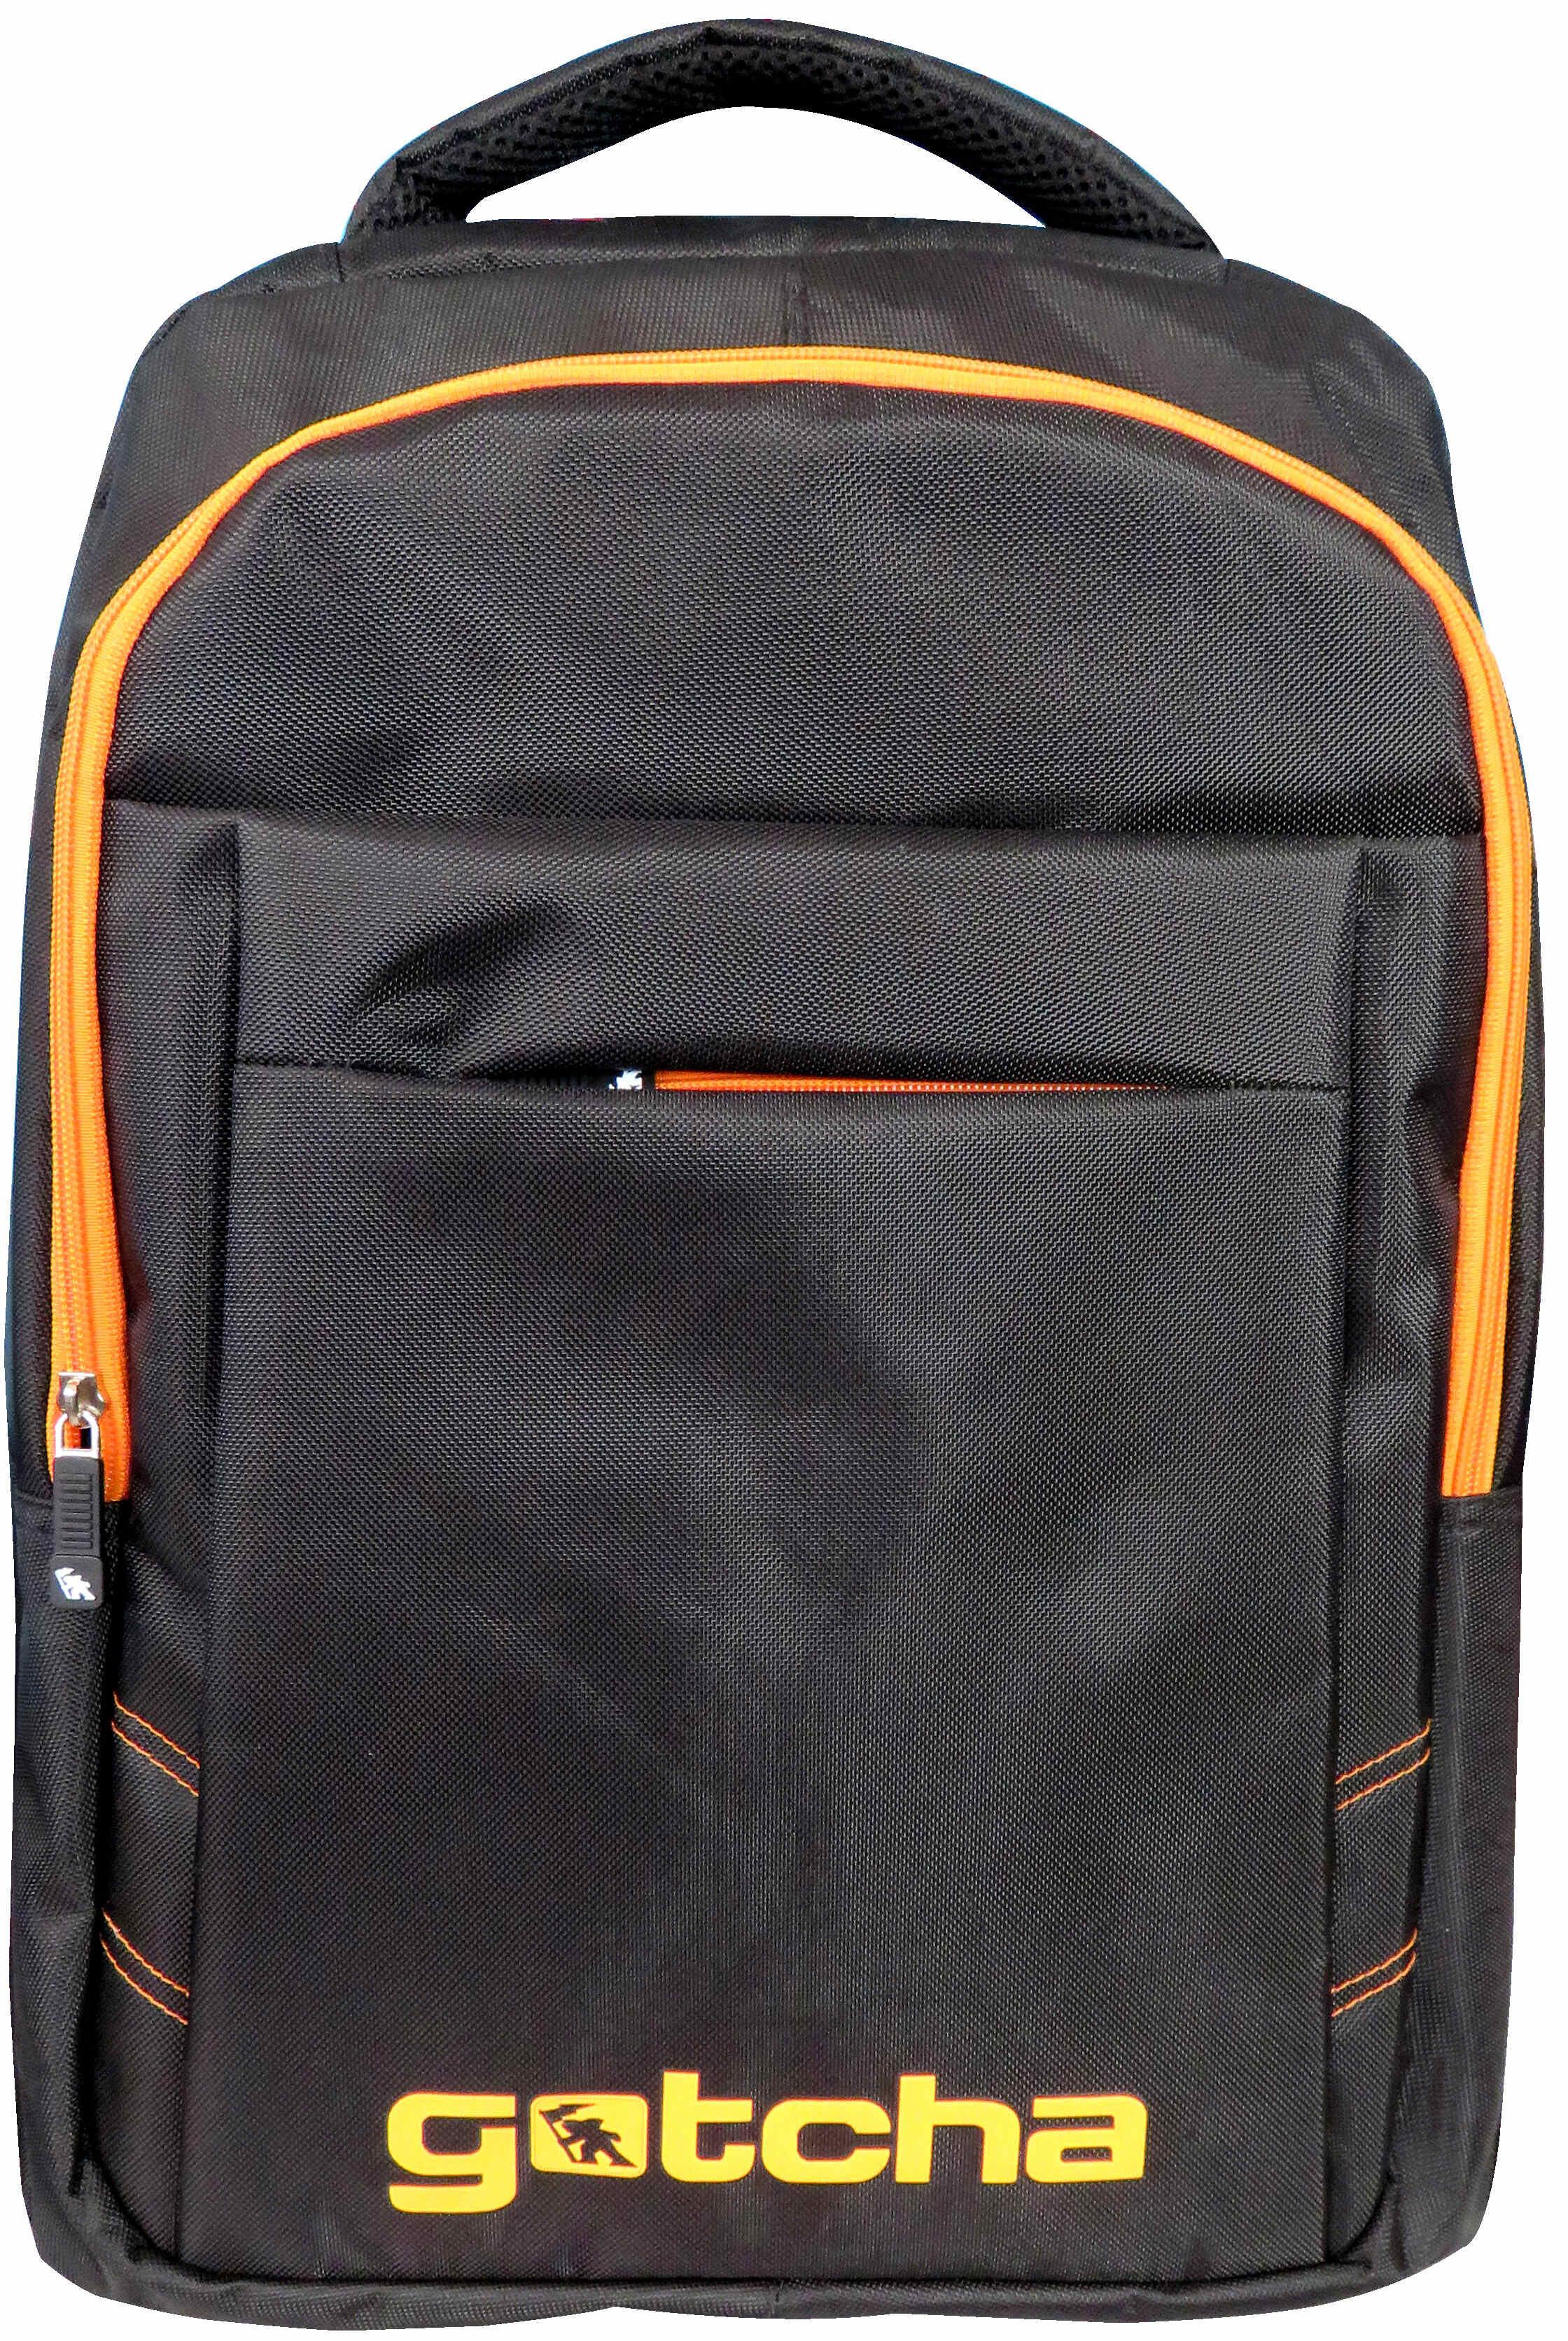 Gotcha Medium School Backpack - Trend Orange